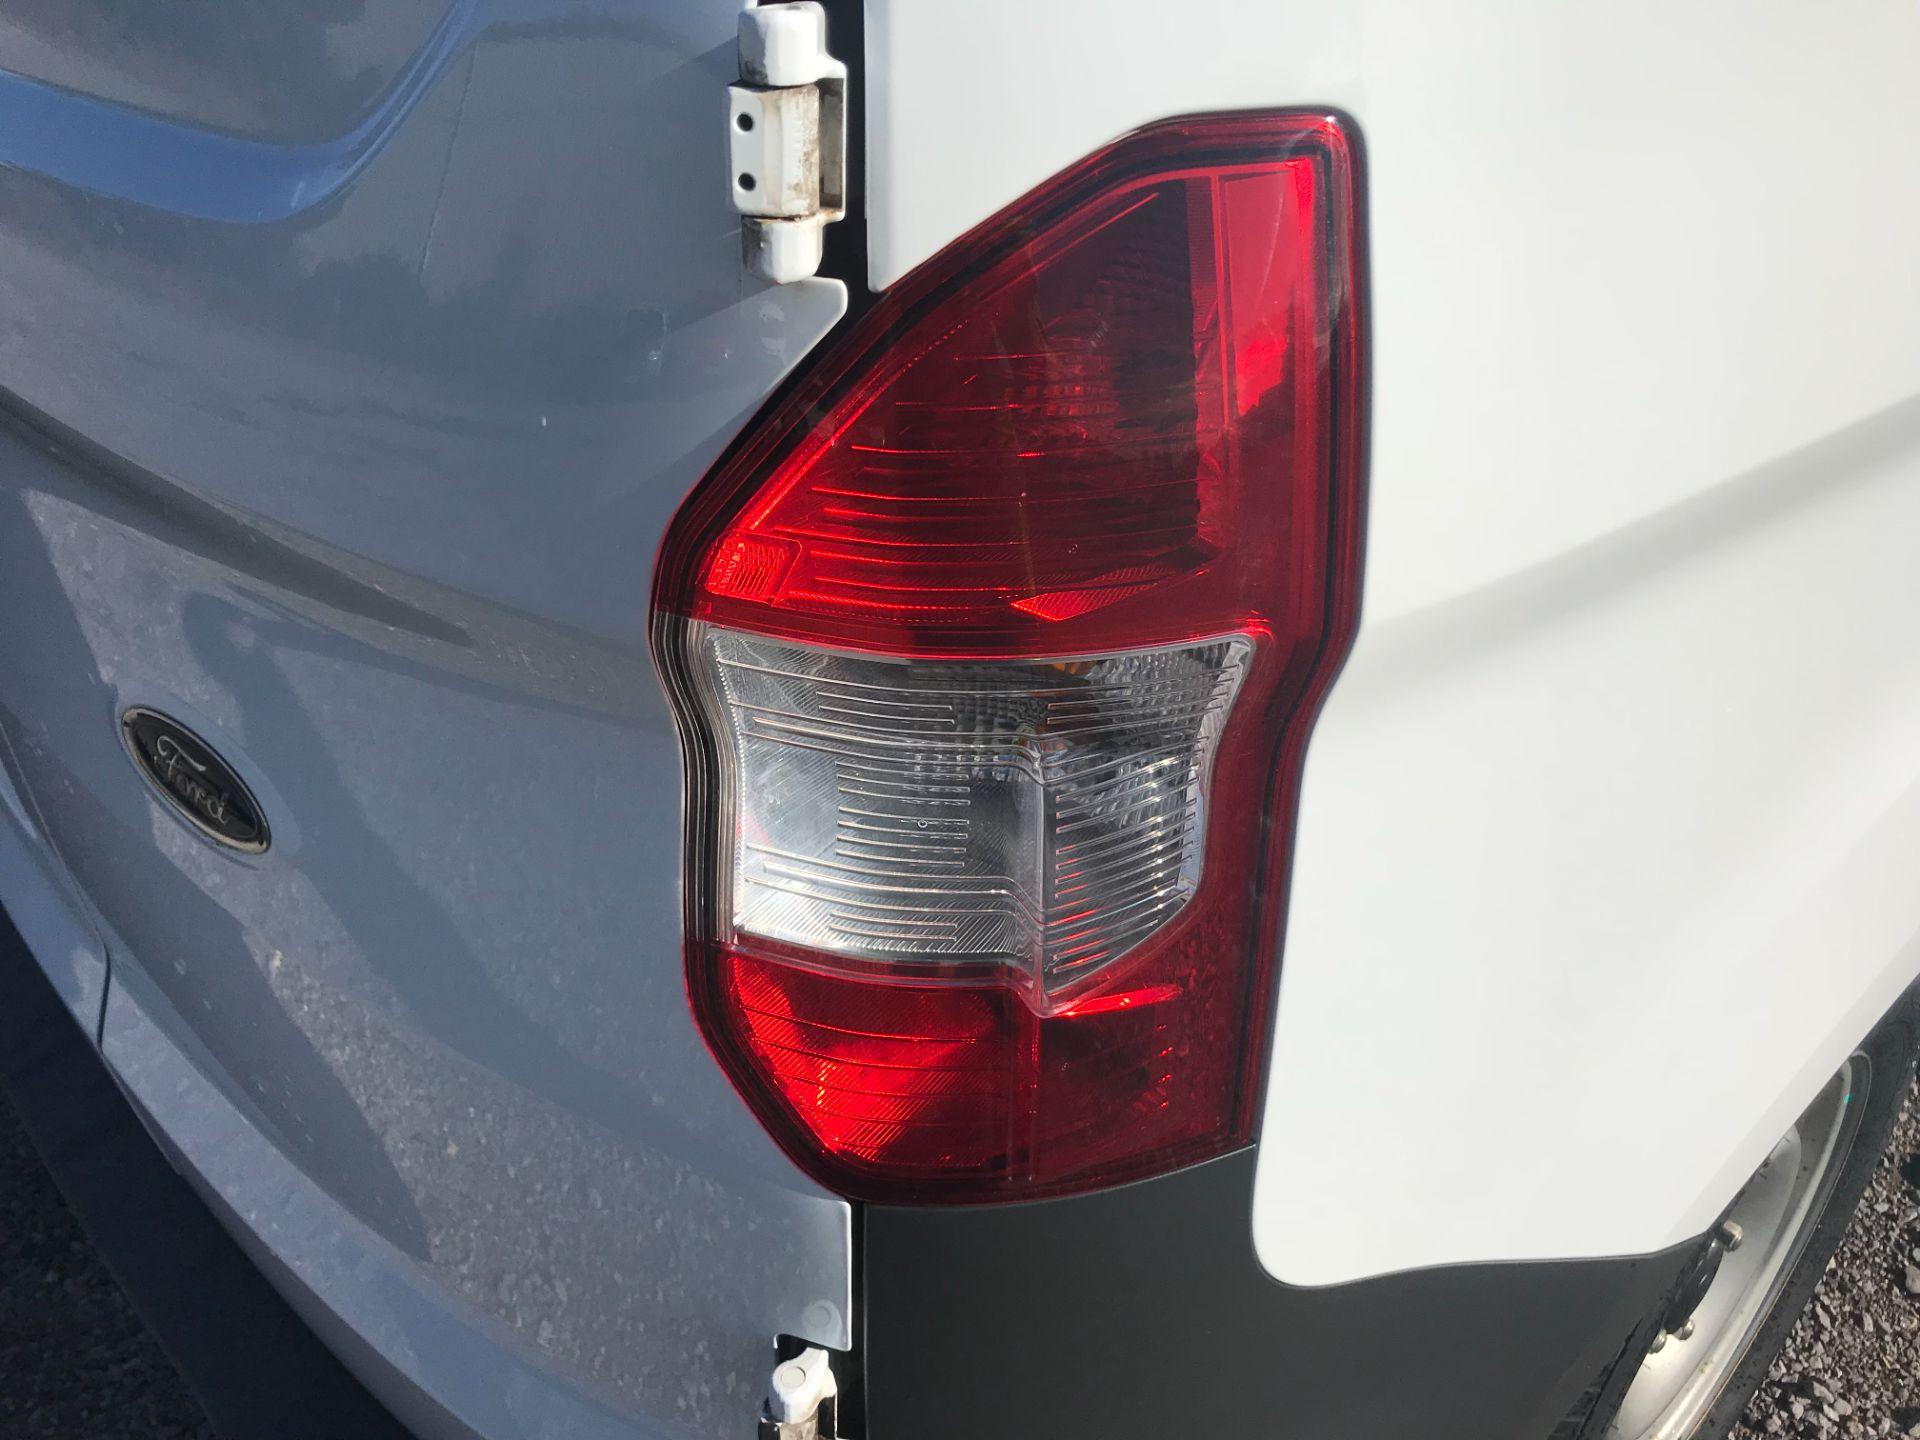 2019 Ford Transit Courier 1.5 Tdci Van Euro 6 (BL69RJZ) Image 15